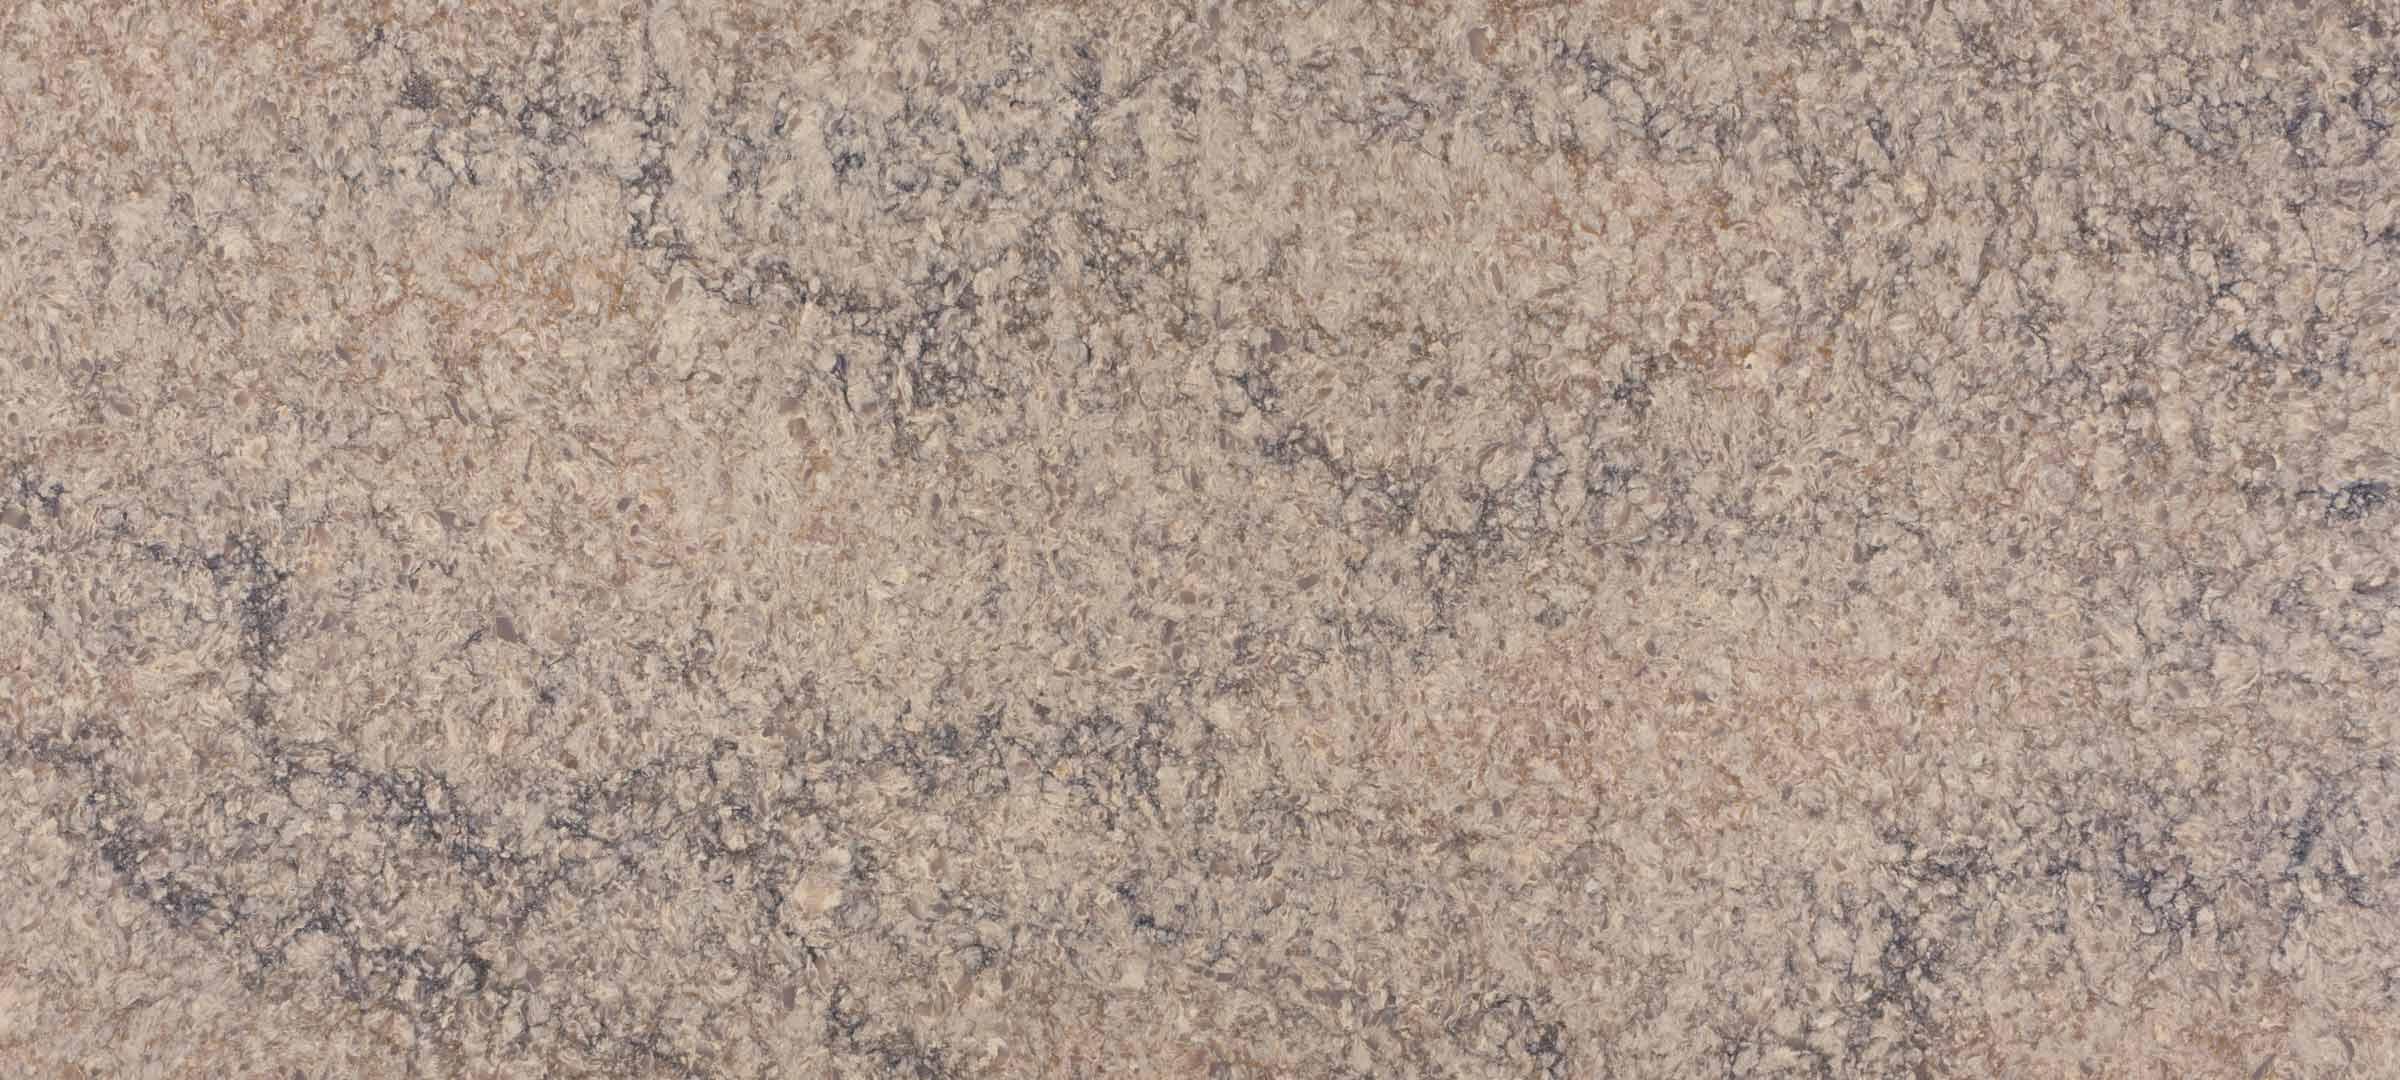 Caesarstone Quartz Gallery Countertops Slabs St